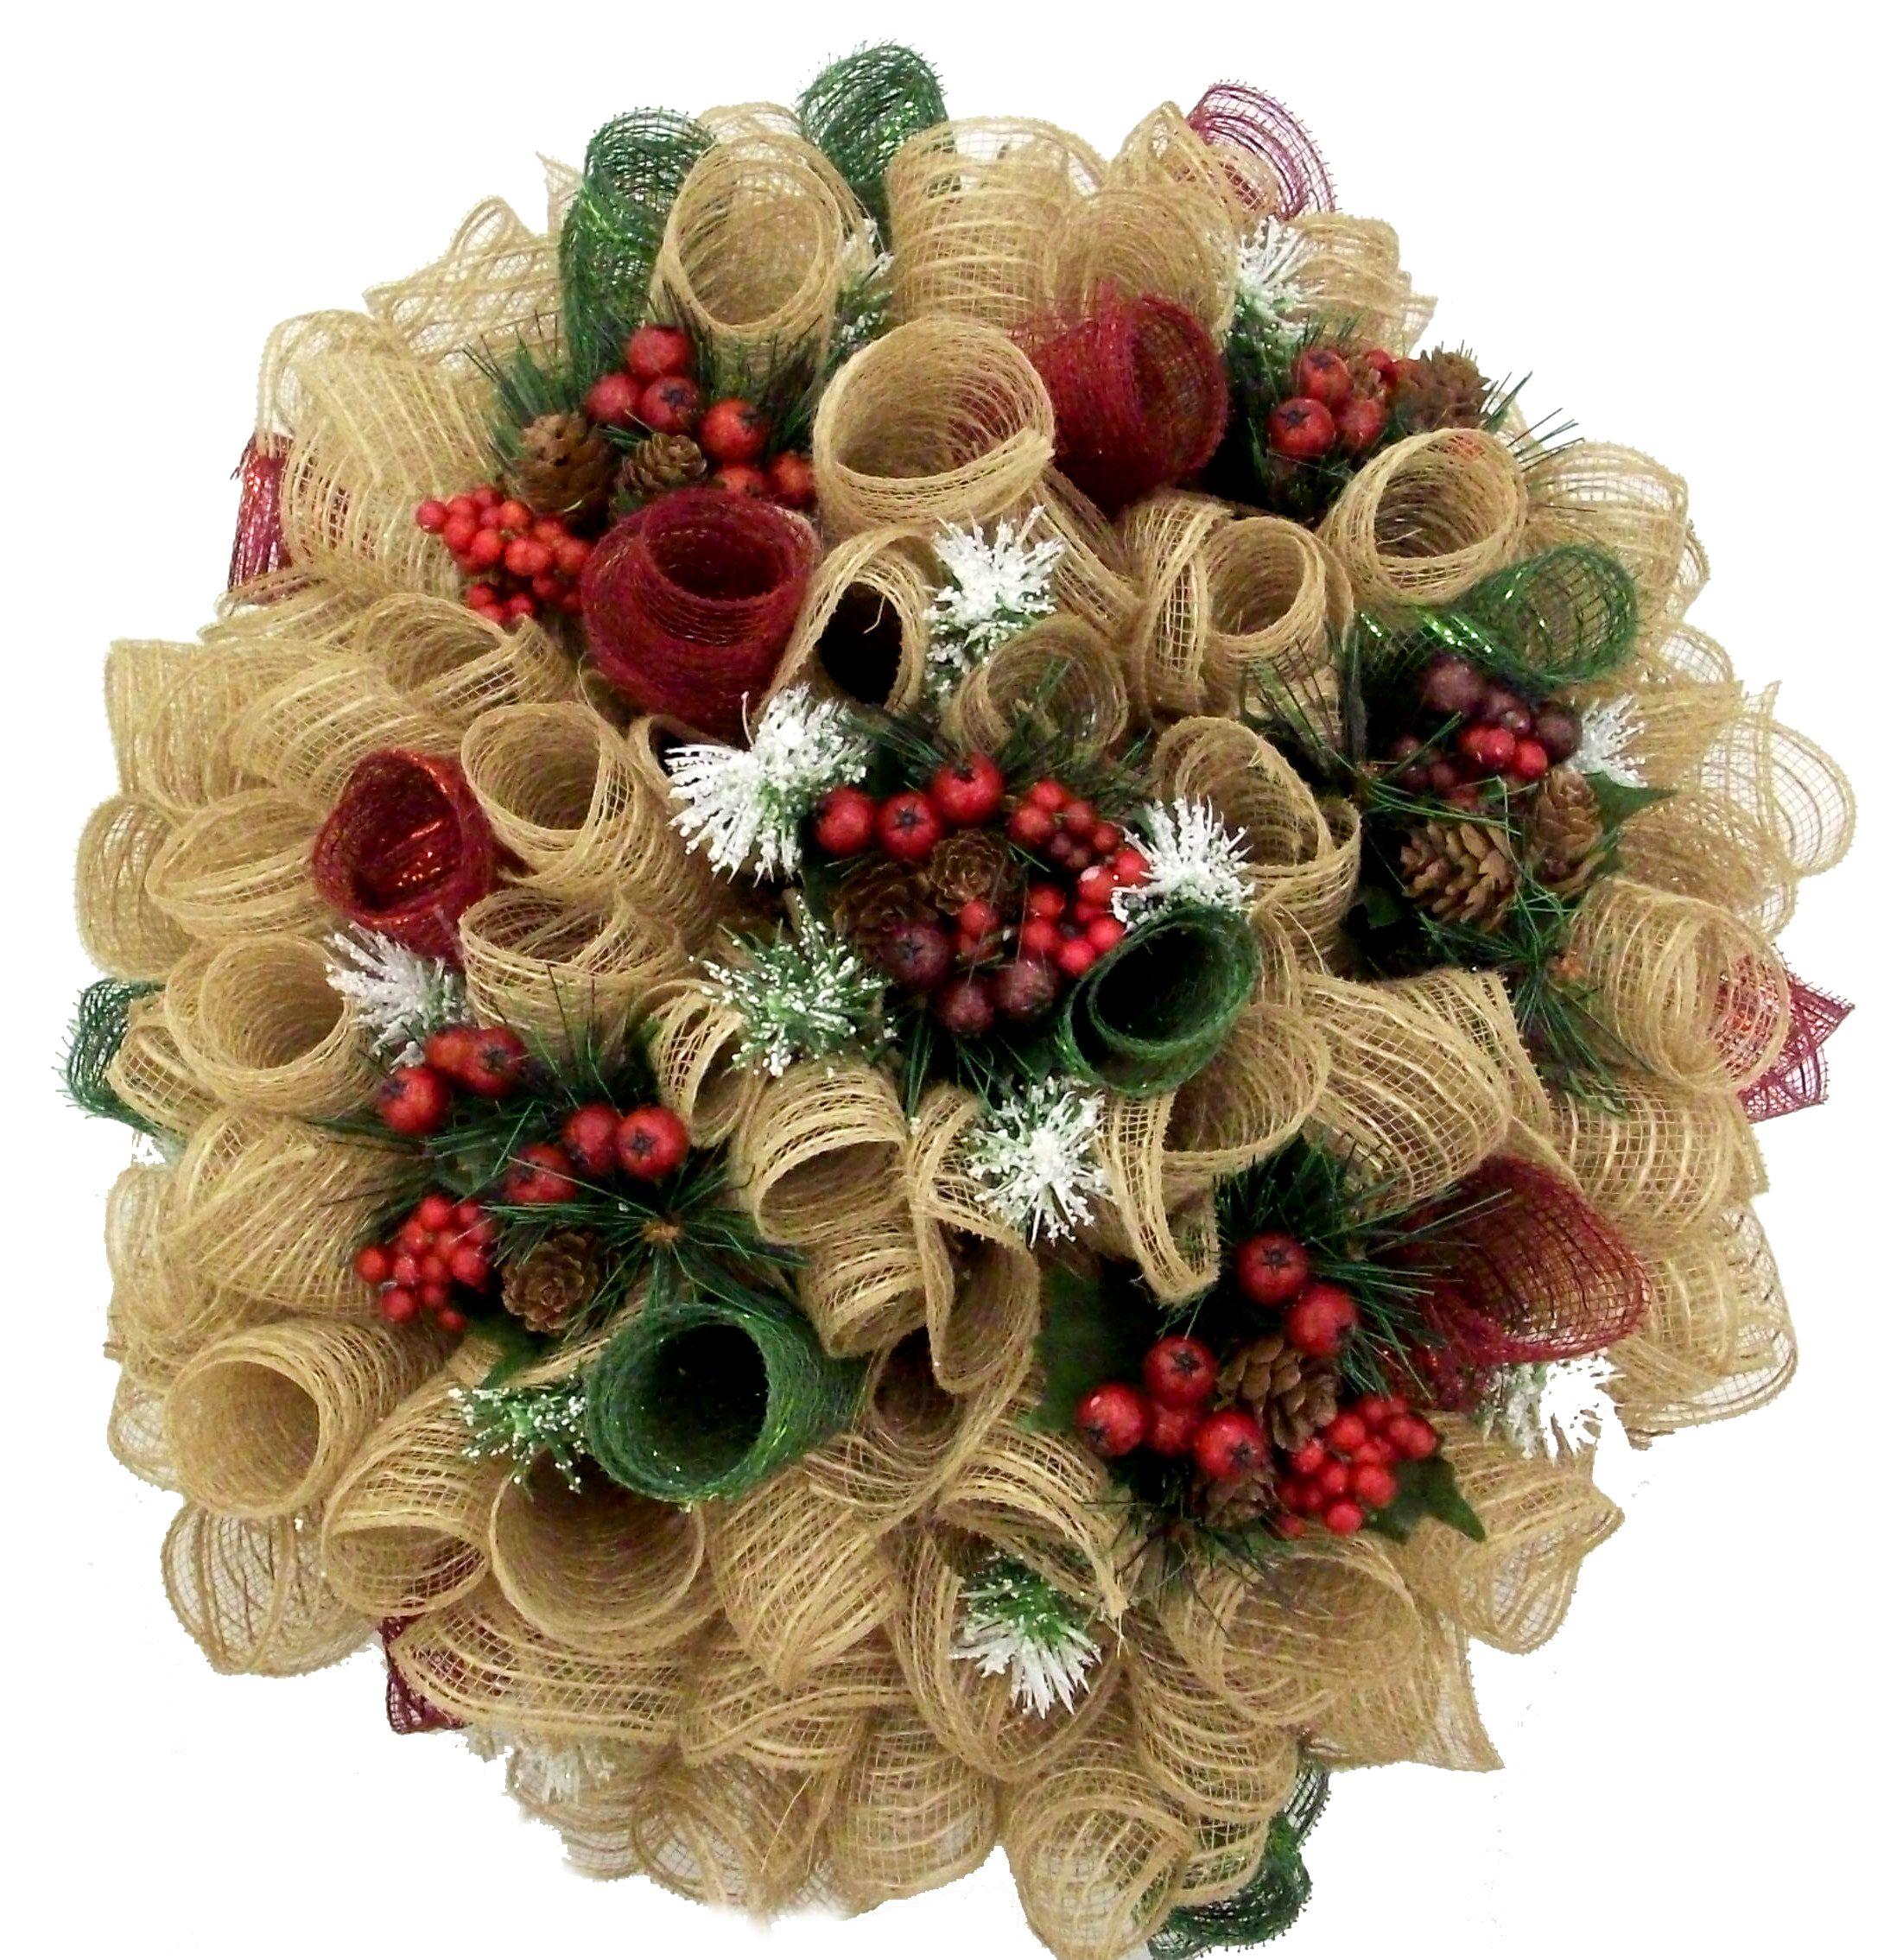 Christmas Burlap Deco Mesh Wreath Designed By Karen B., A